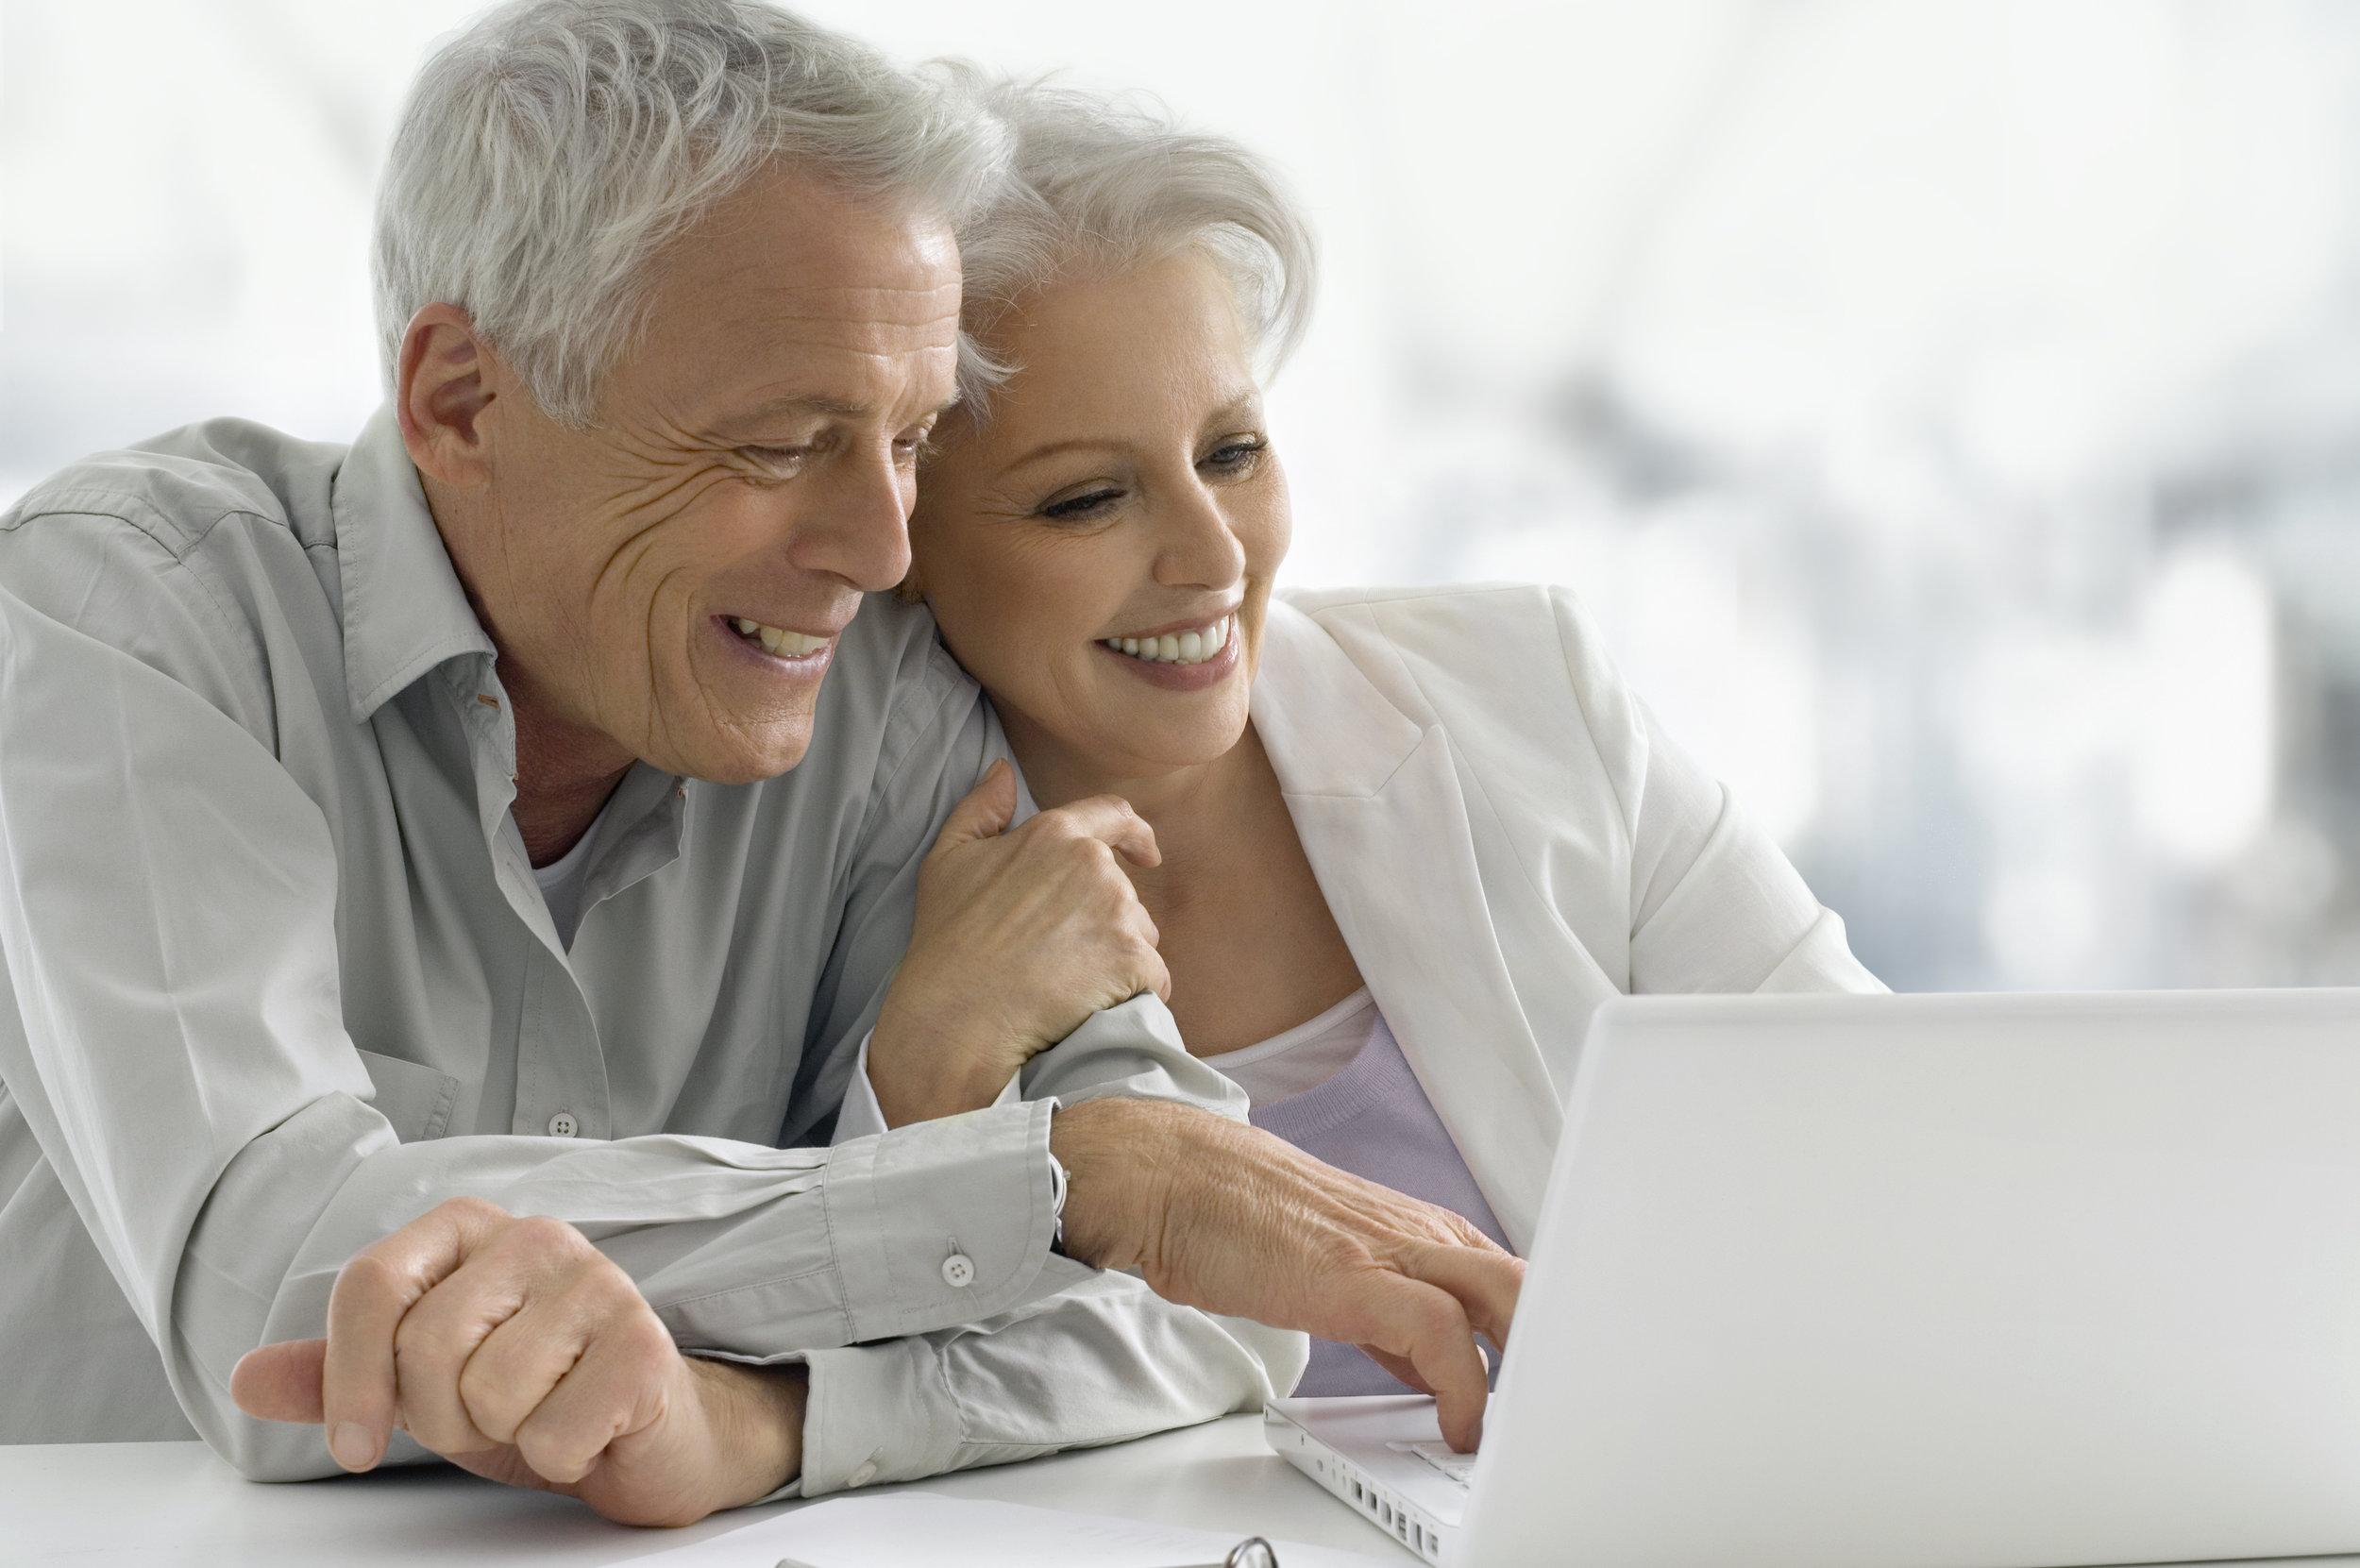 older couple_iStock_000014041889XLarge.jpg